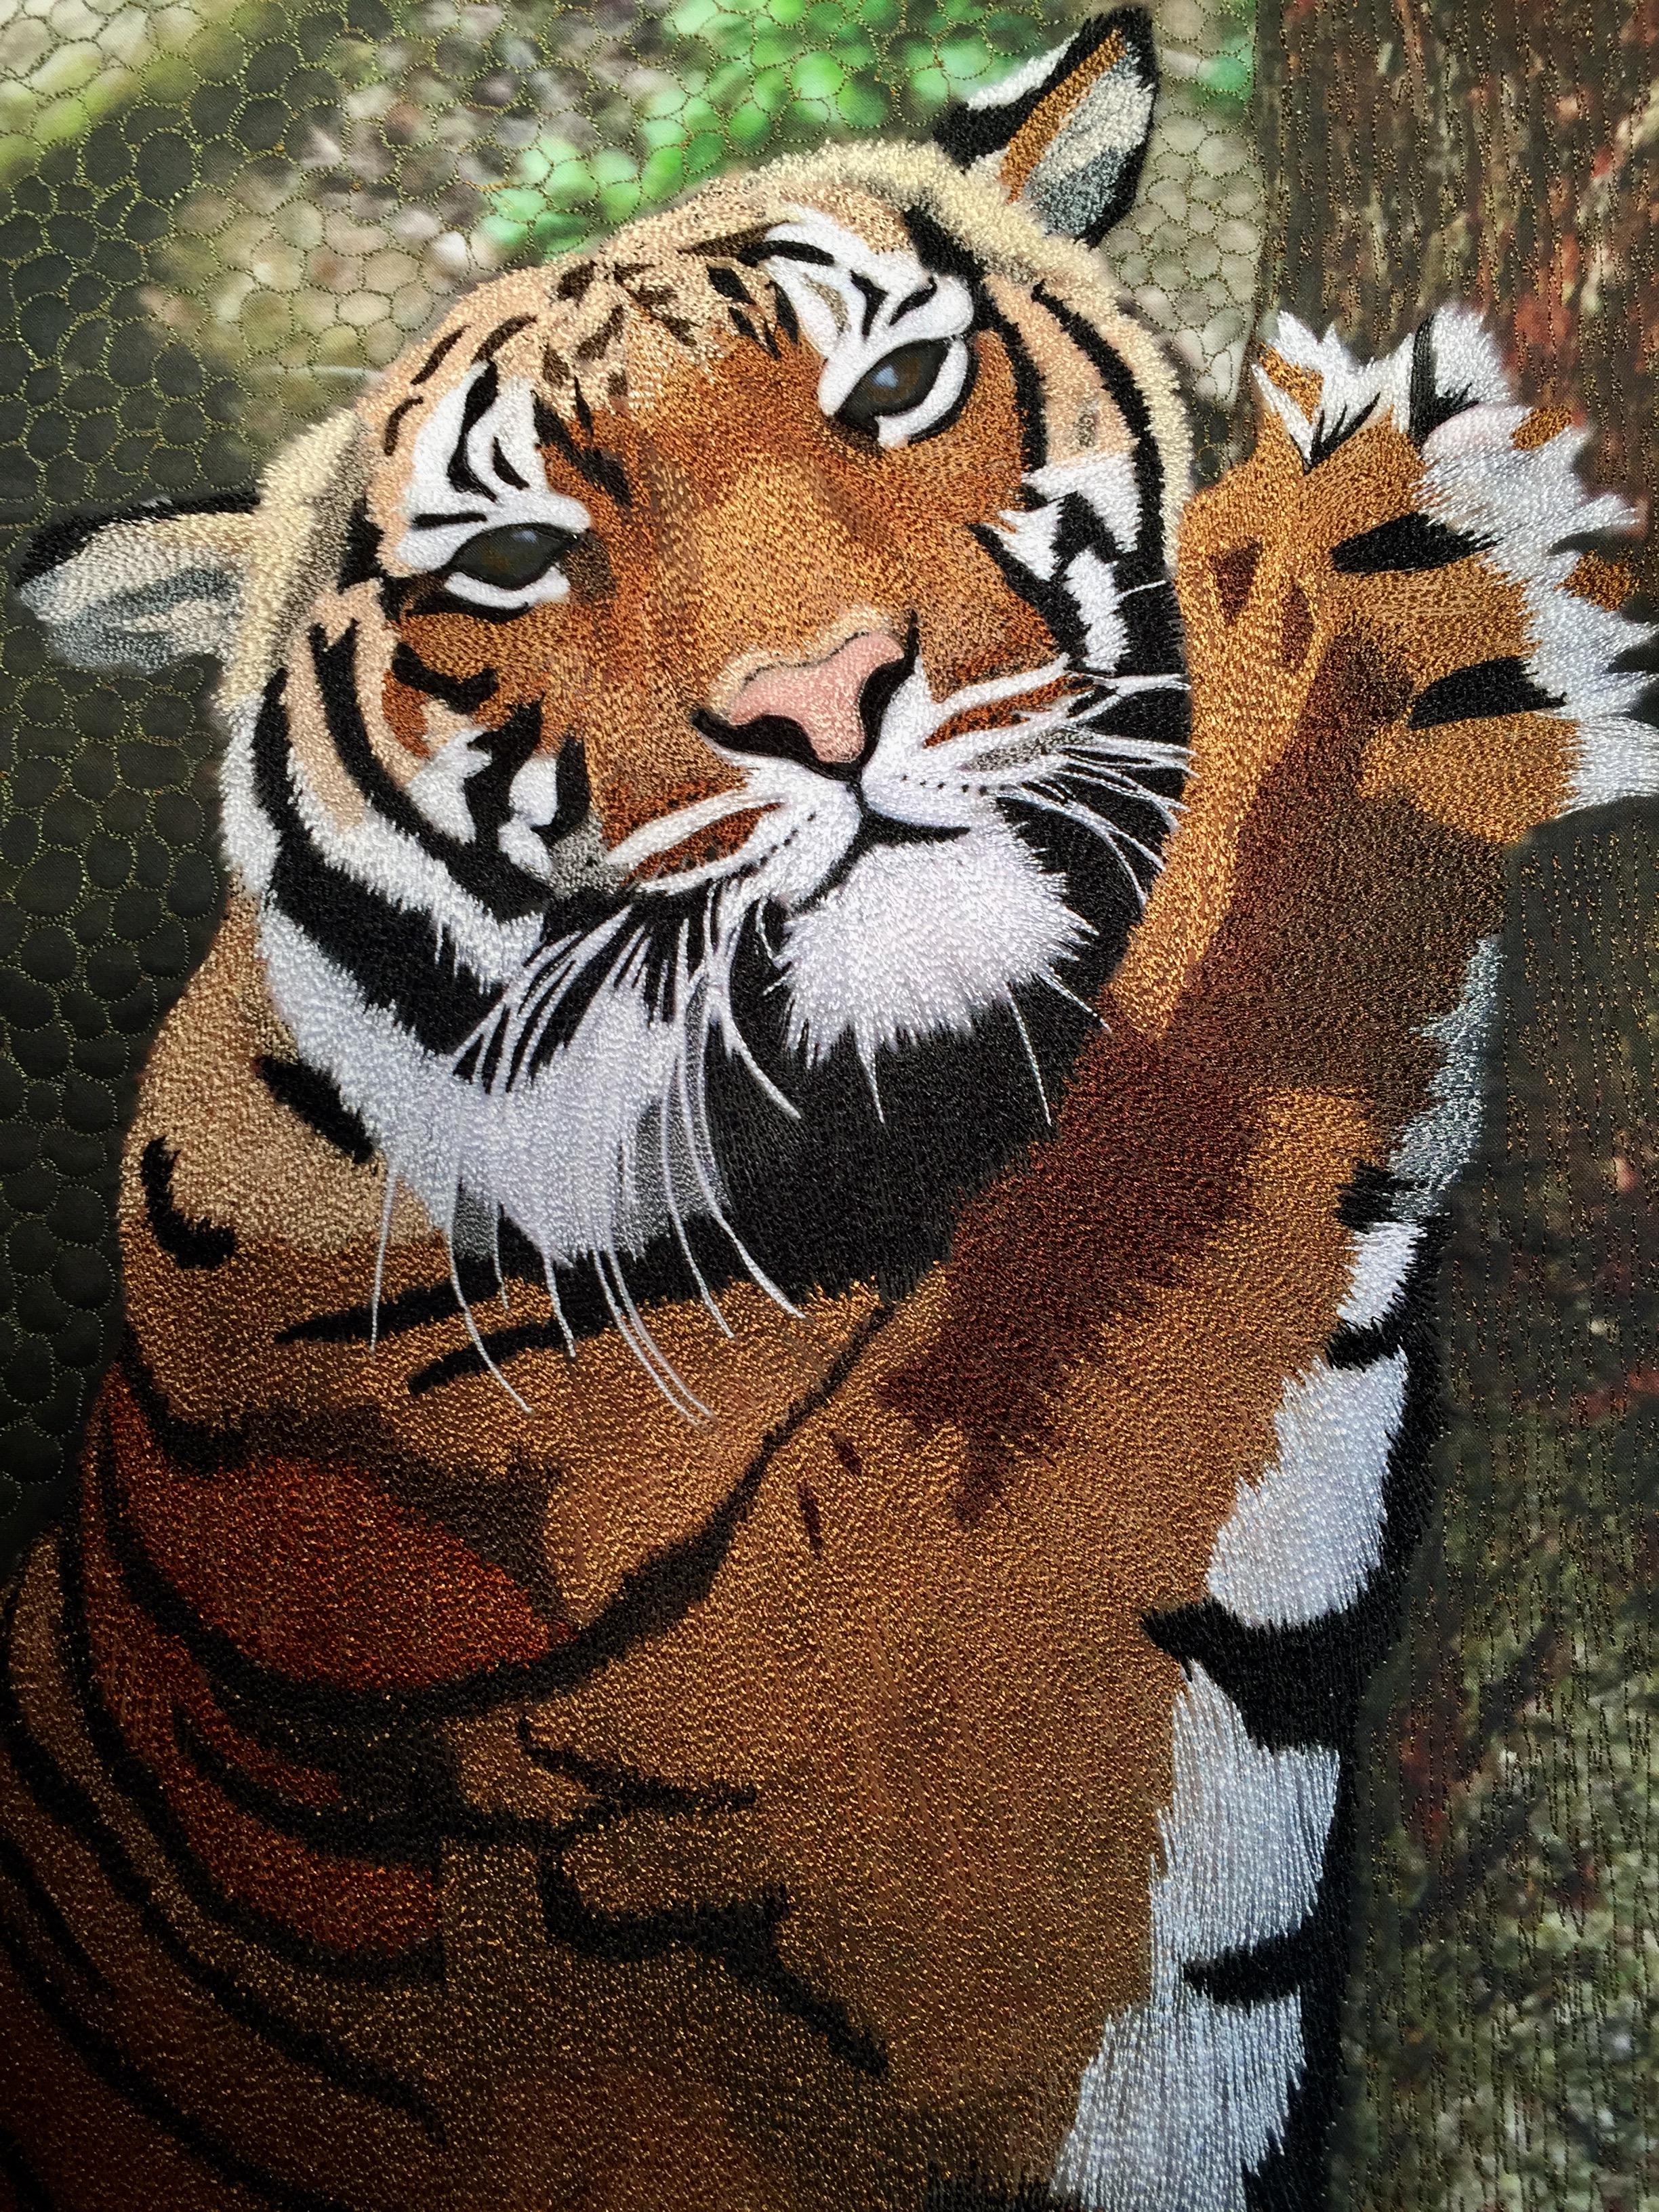 Tiger by Teresa Schlabach